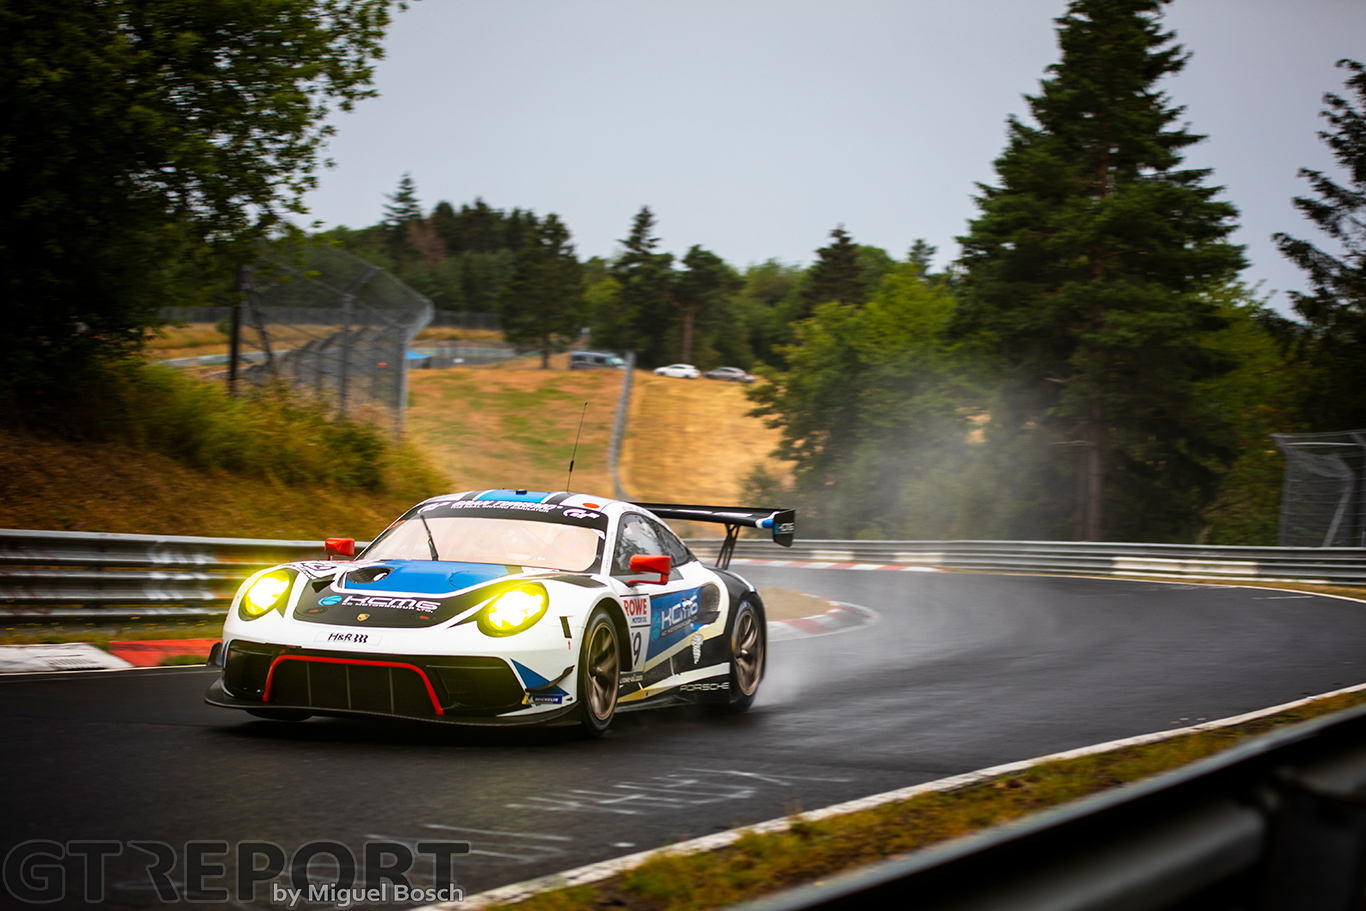 KCMG enters single Porsche in Nürburgring 24 Hours